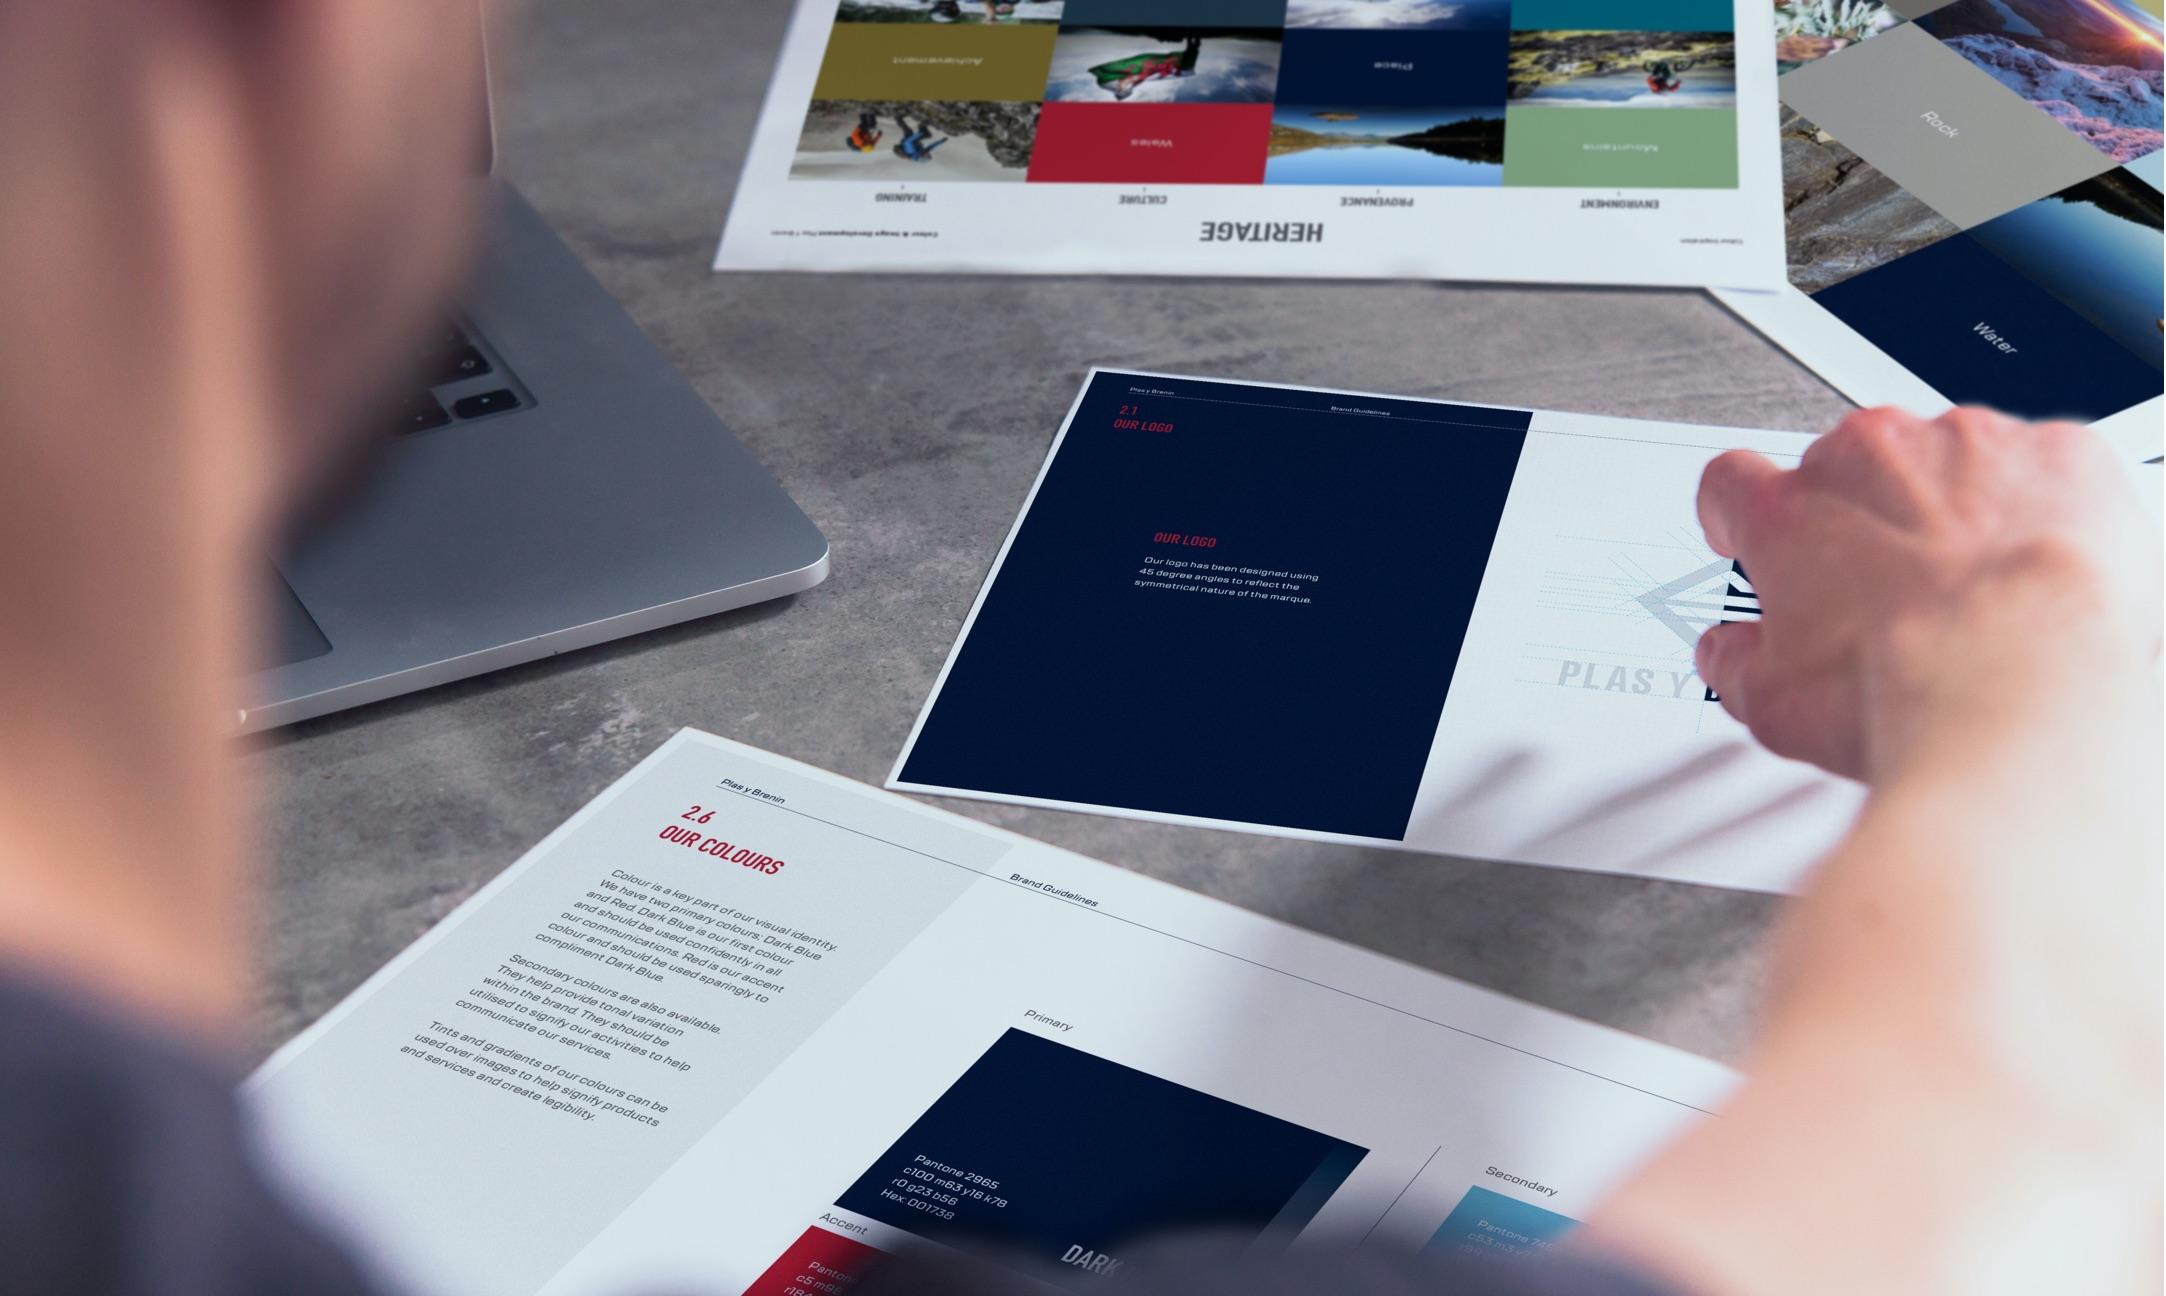 Plas Y Brenin (PYB) printed materials